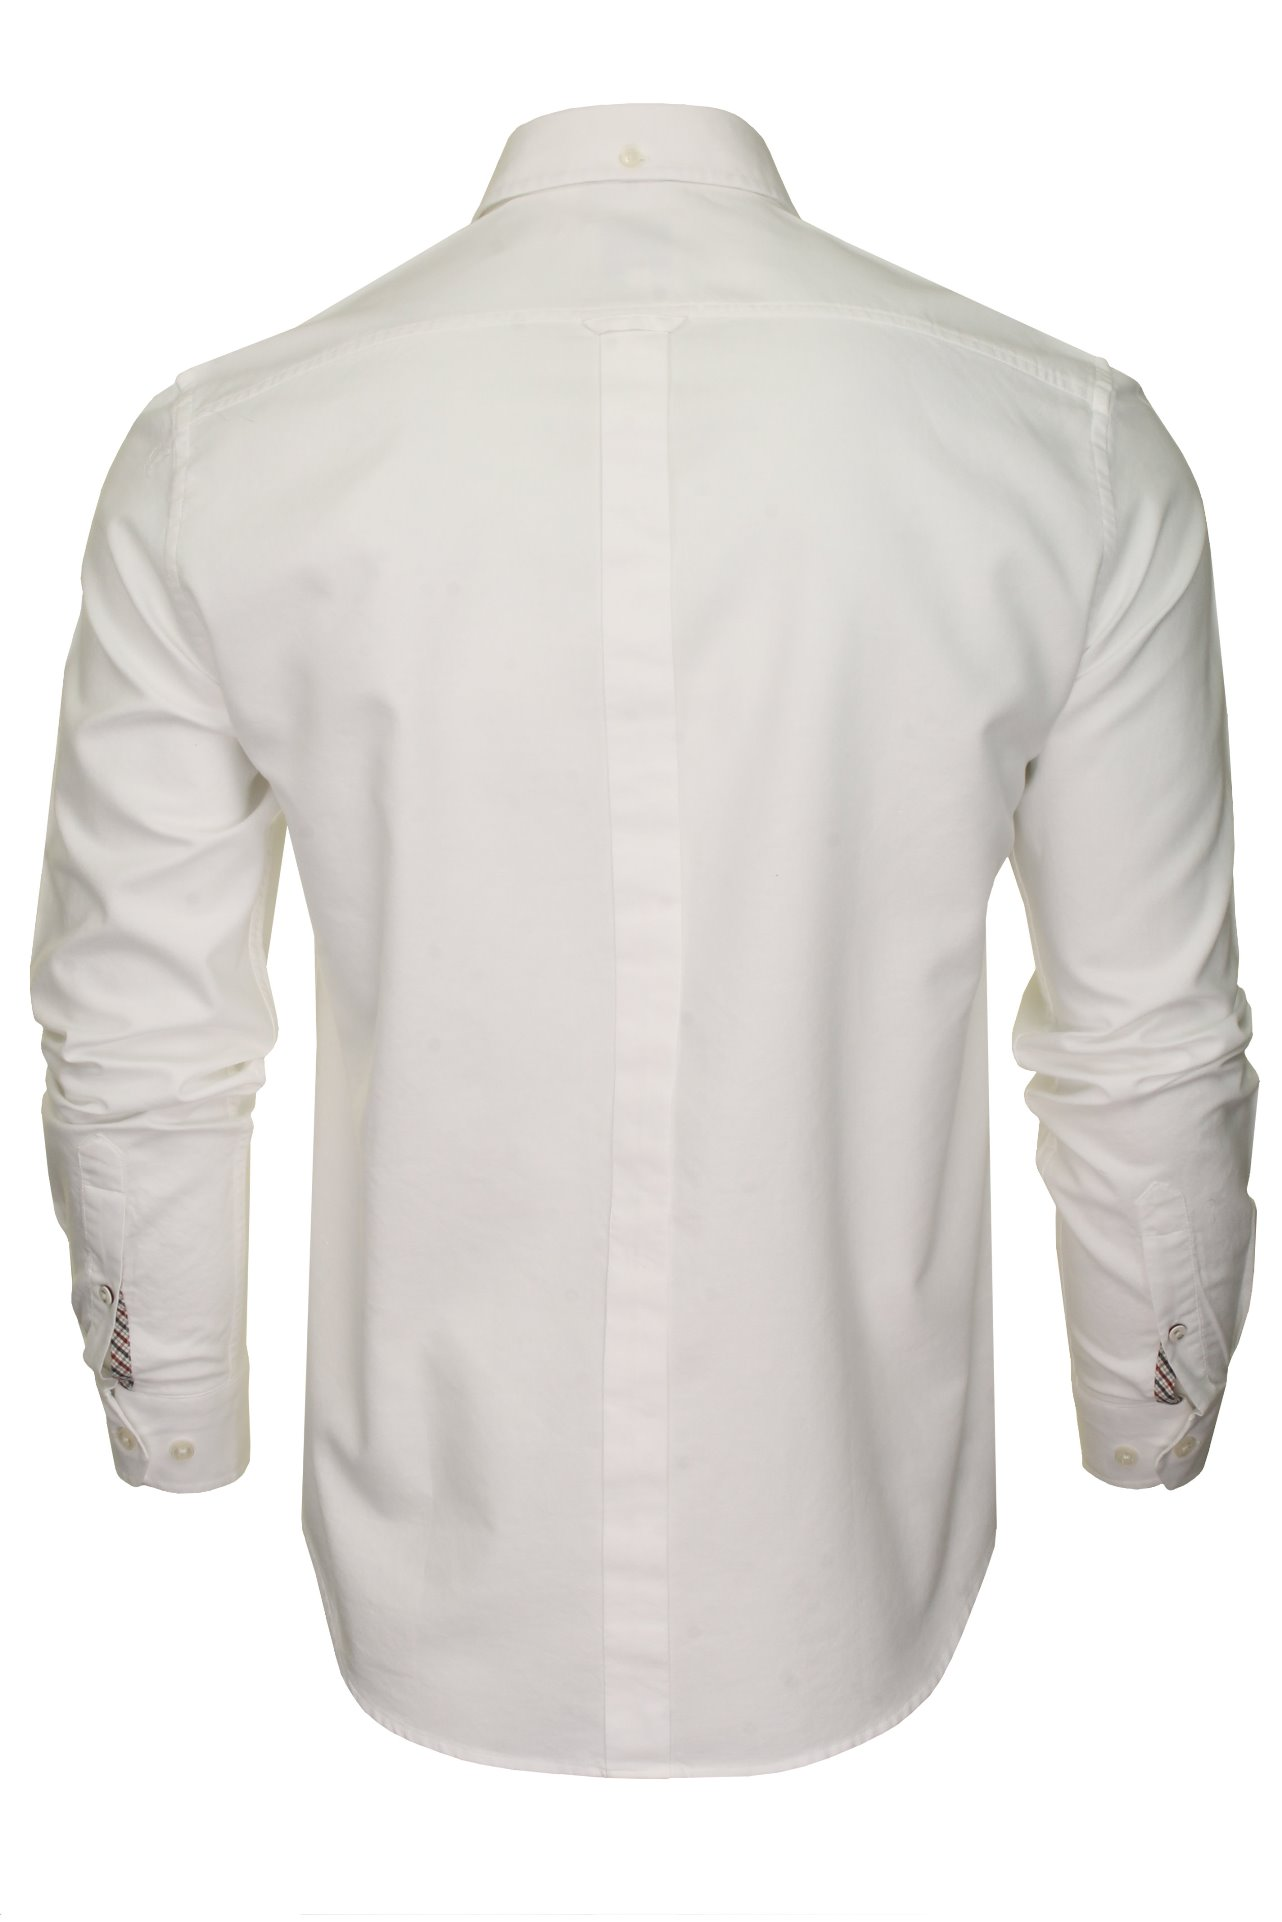 Mens-Oxford-Shirt-by-Ben-Sherman-Long-Sleeved thumbnail 45